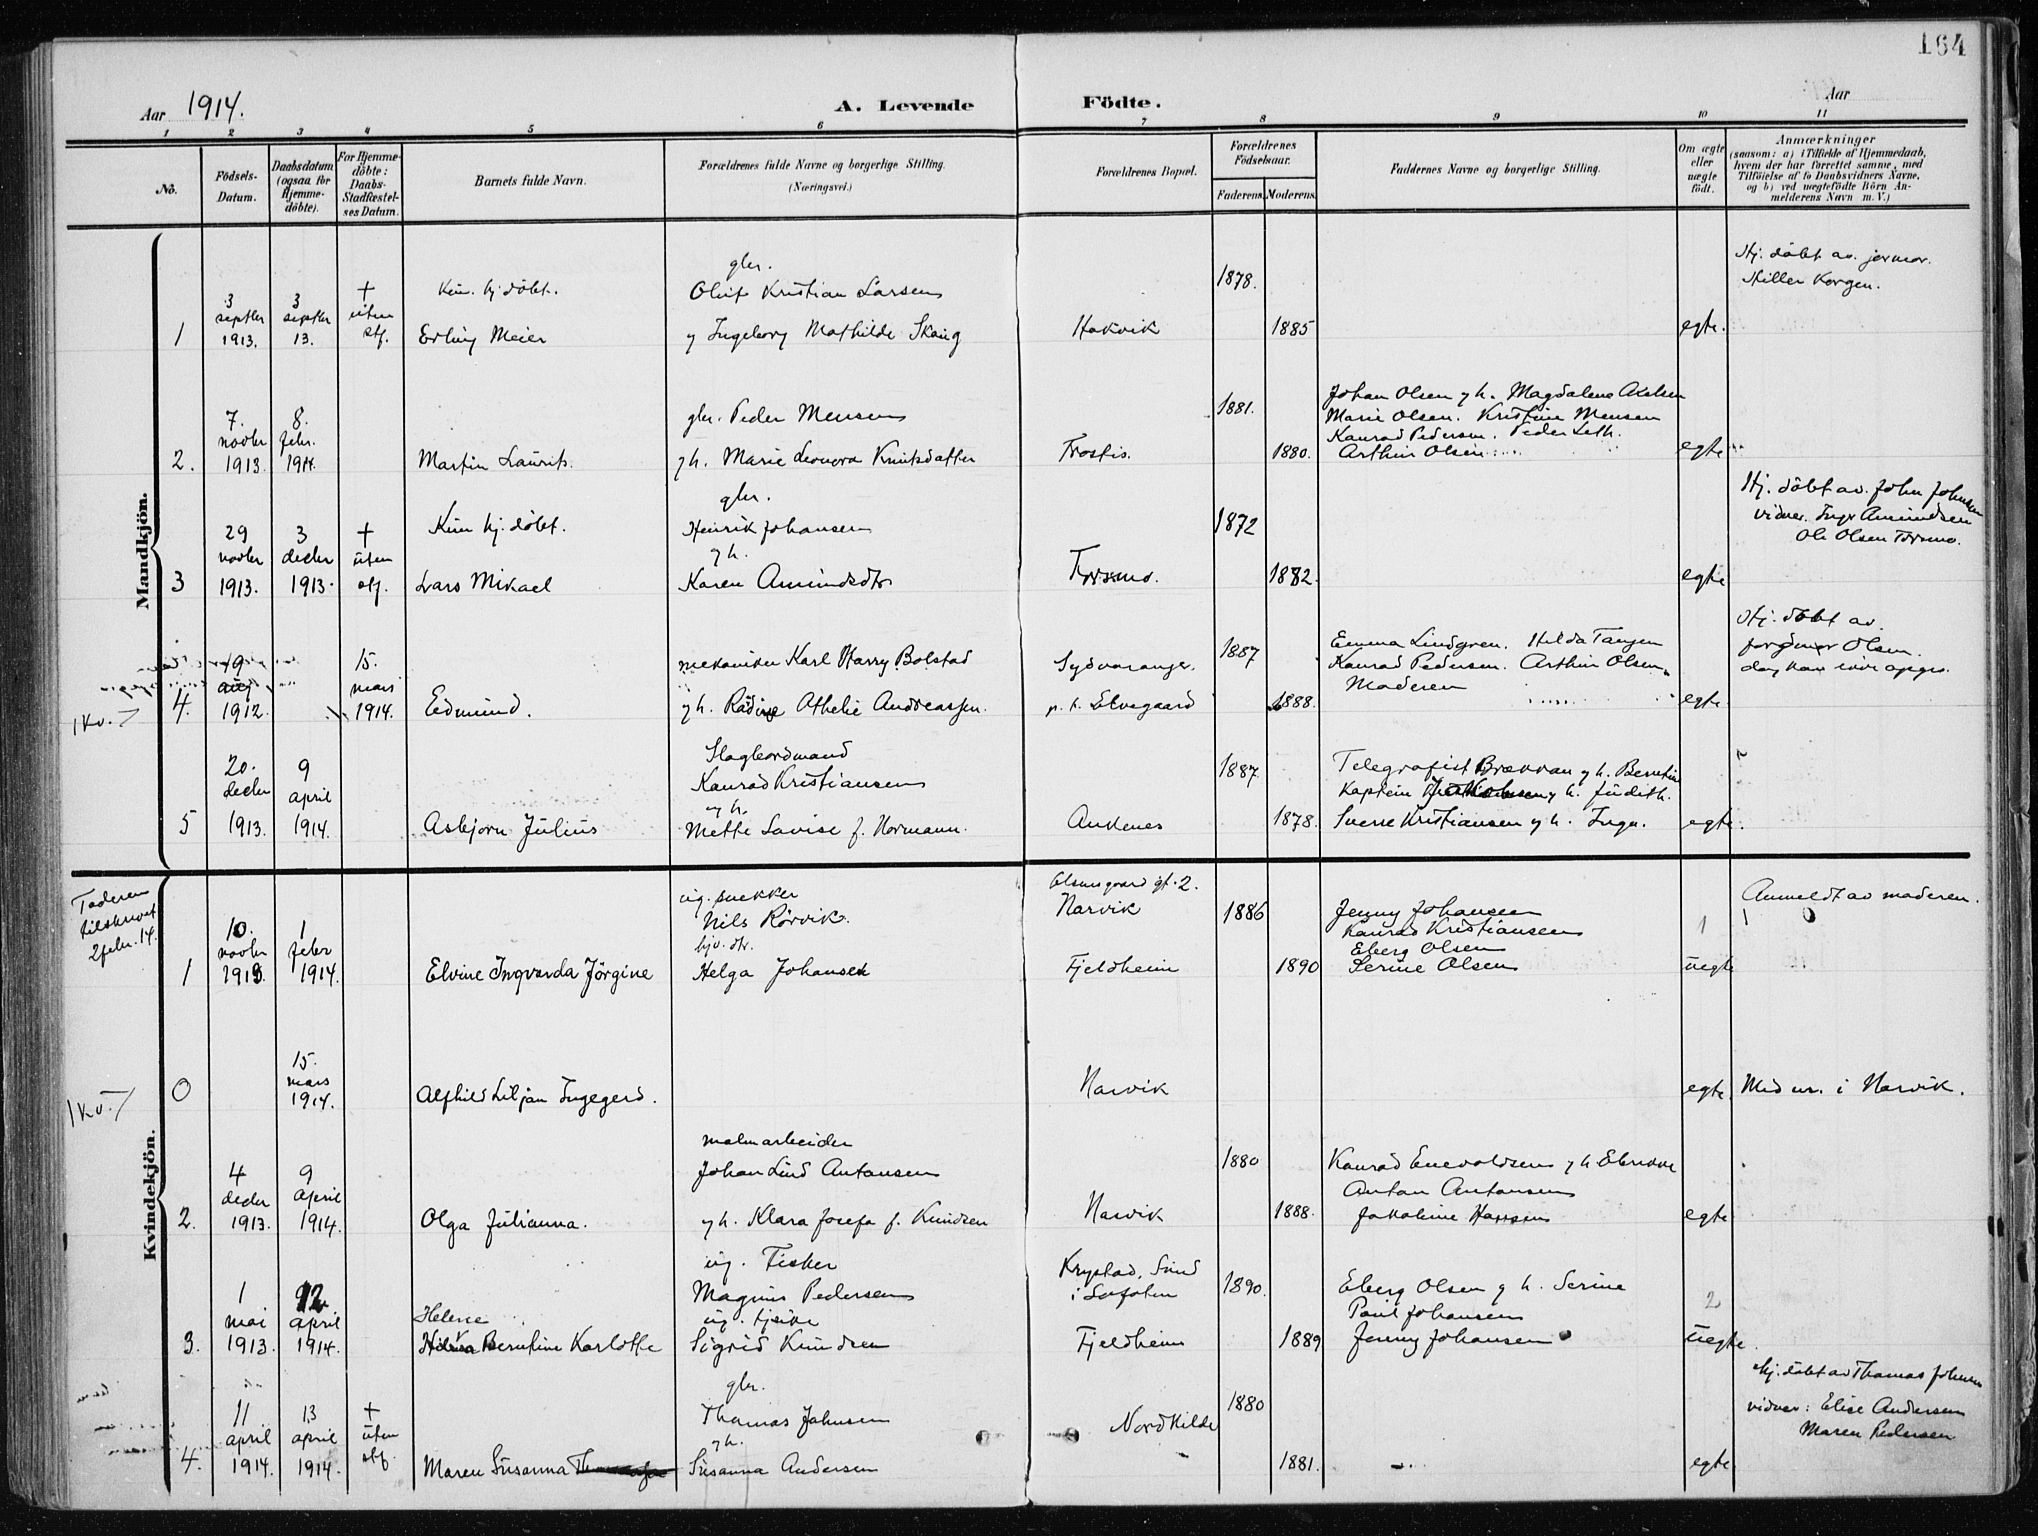 SAT, Ministerialprotokoller, klokkerbøker og fødselsregistre - Nordland, 866/L0941: Ministerialbok nr. 866A04, 1901-1917, s. 164